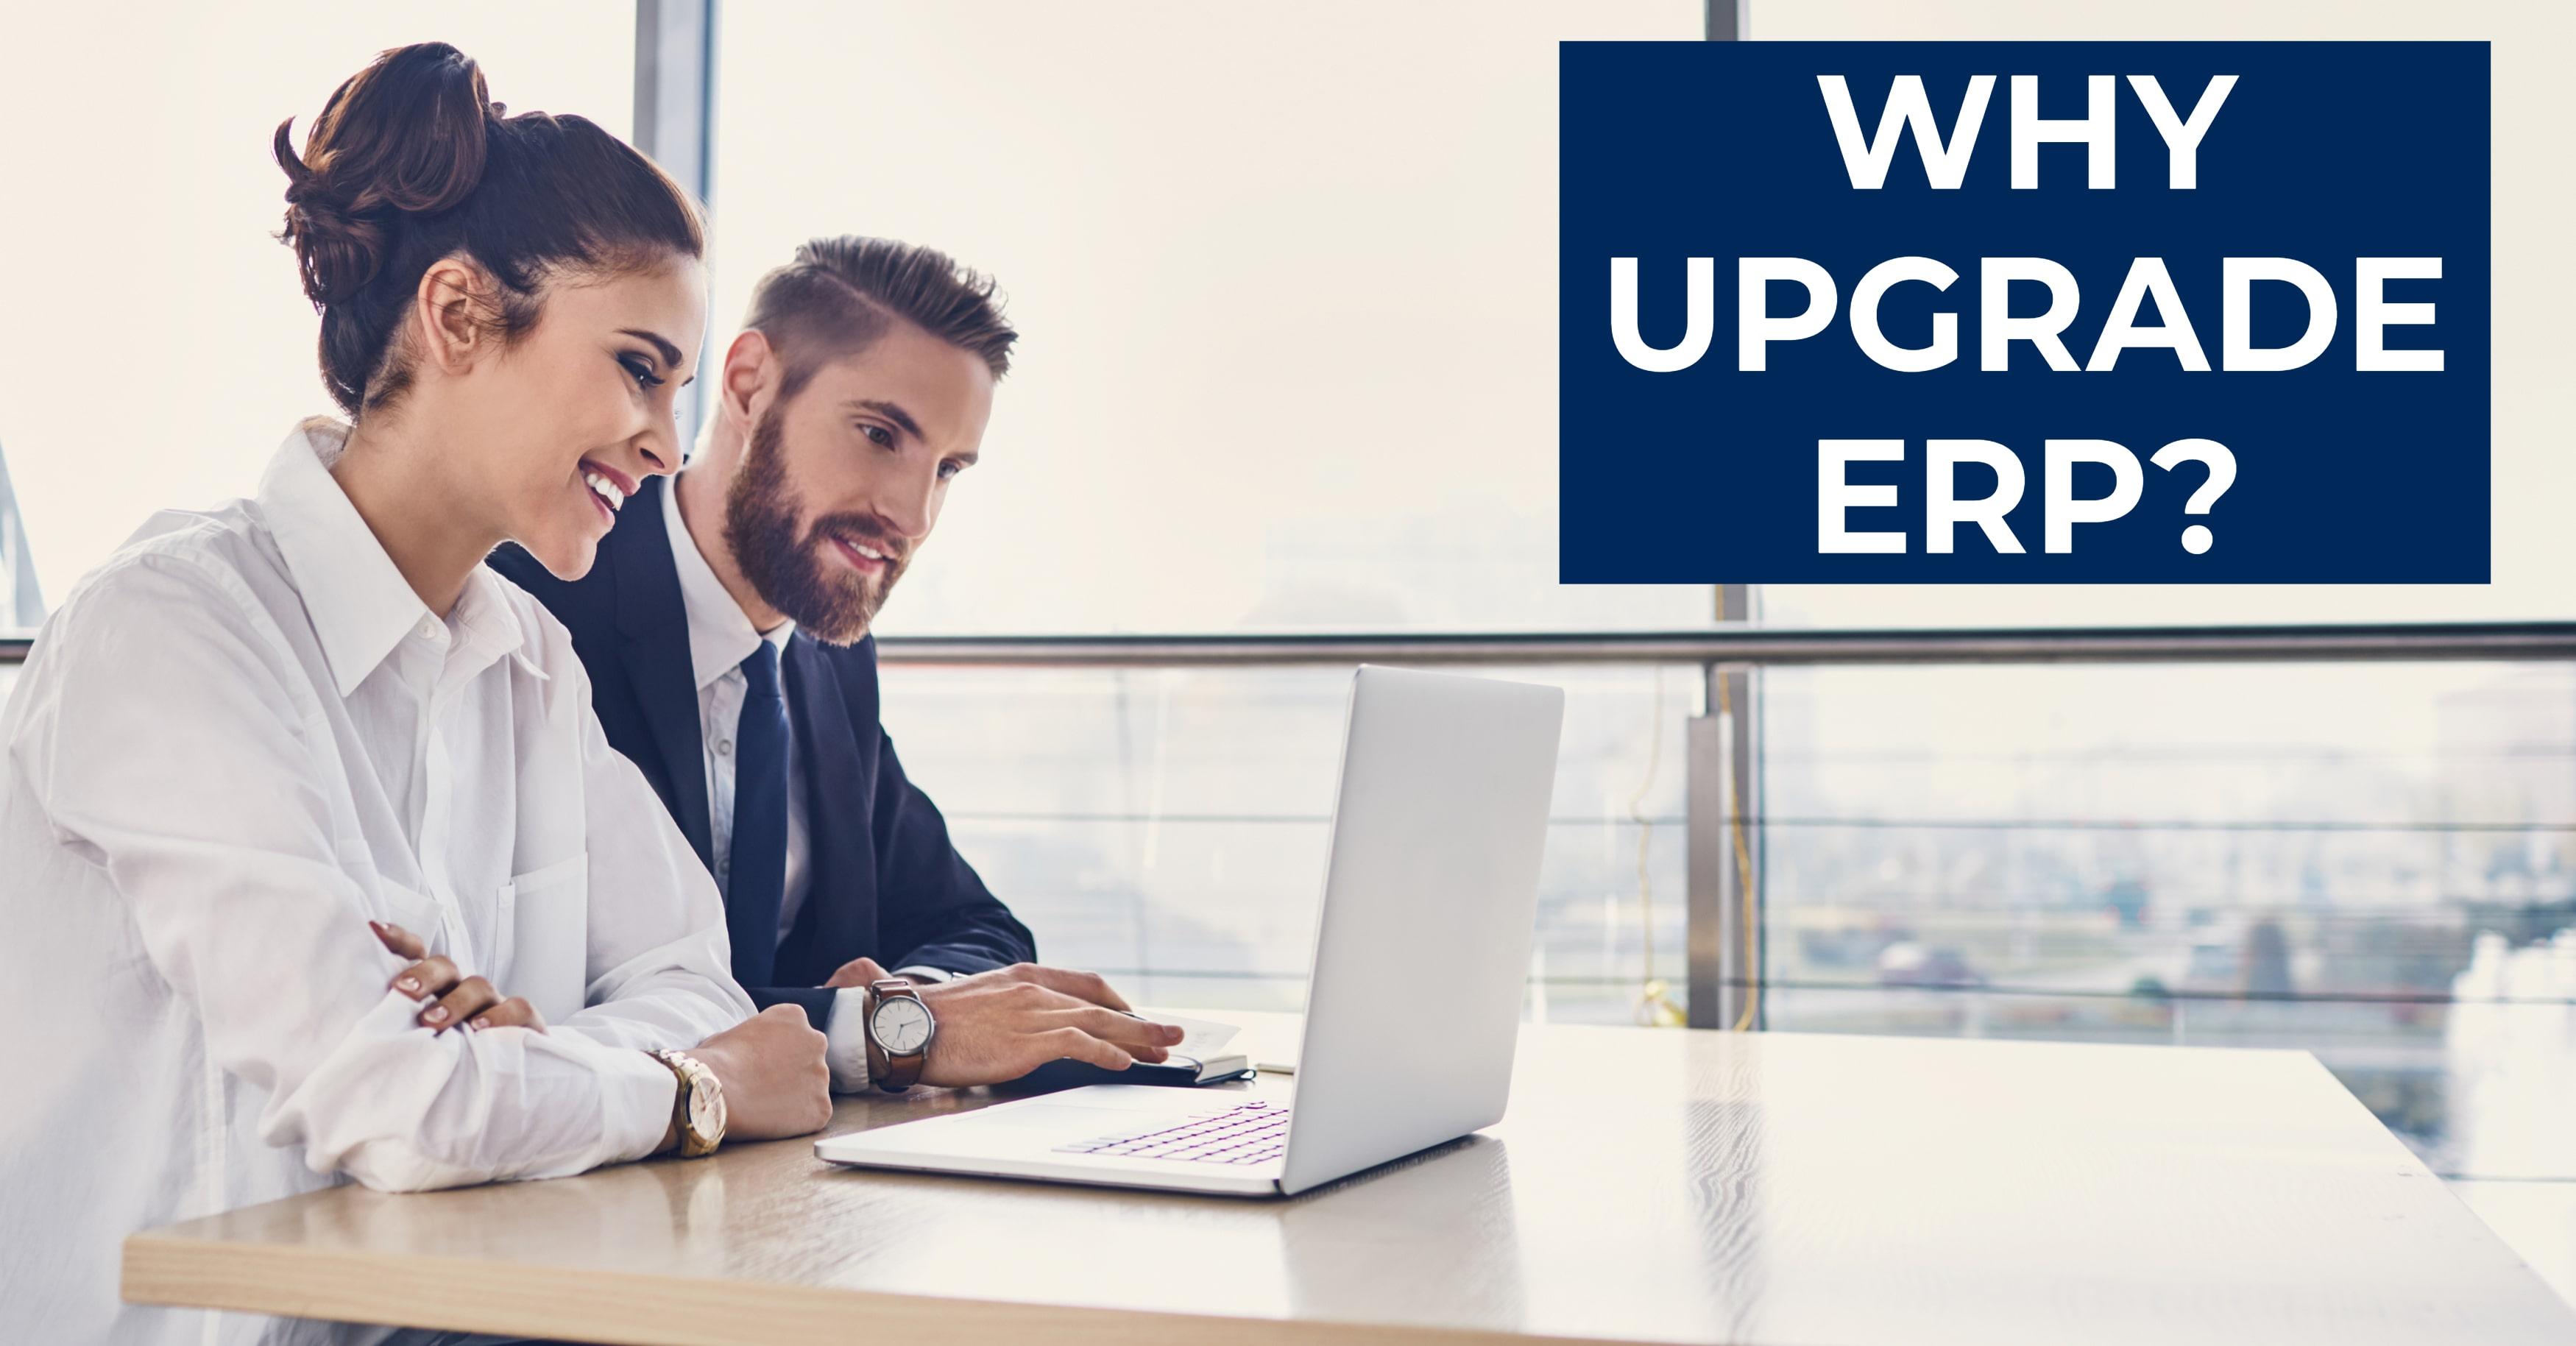 Upgrade ERP